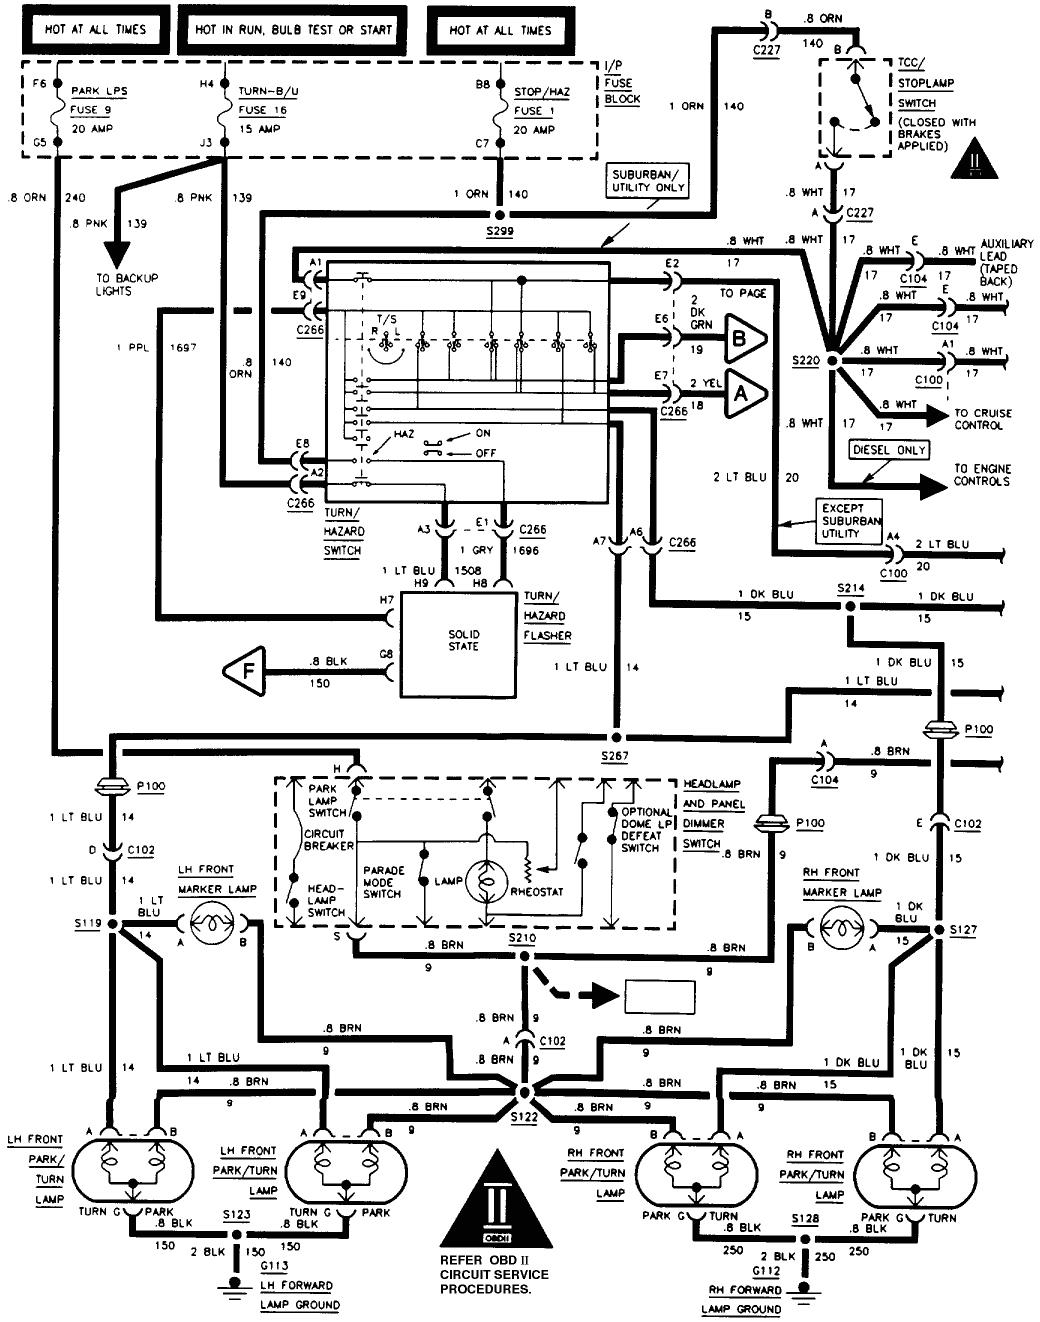 97 chevy z71 wiring diagram wiring diagram experts gif